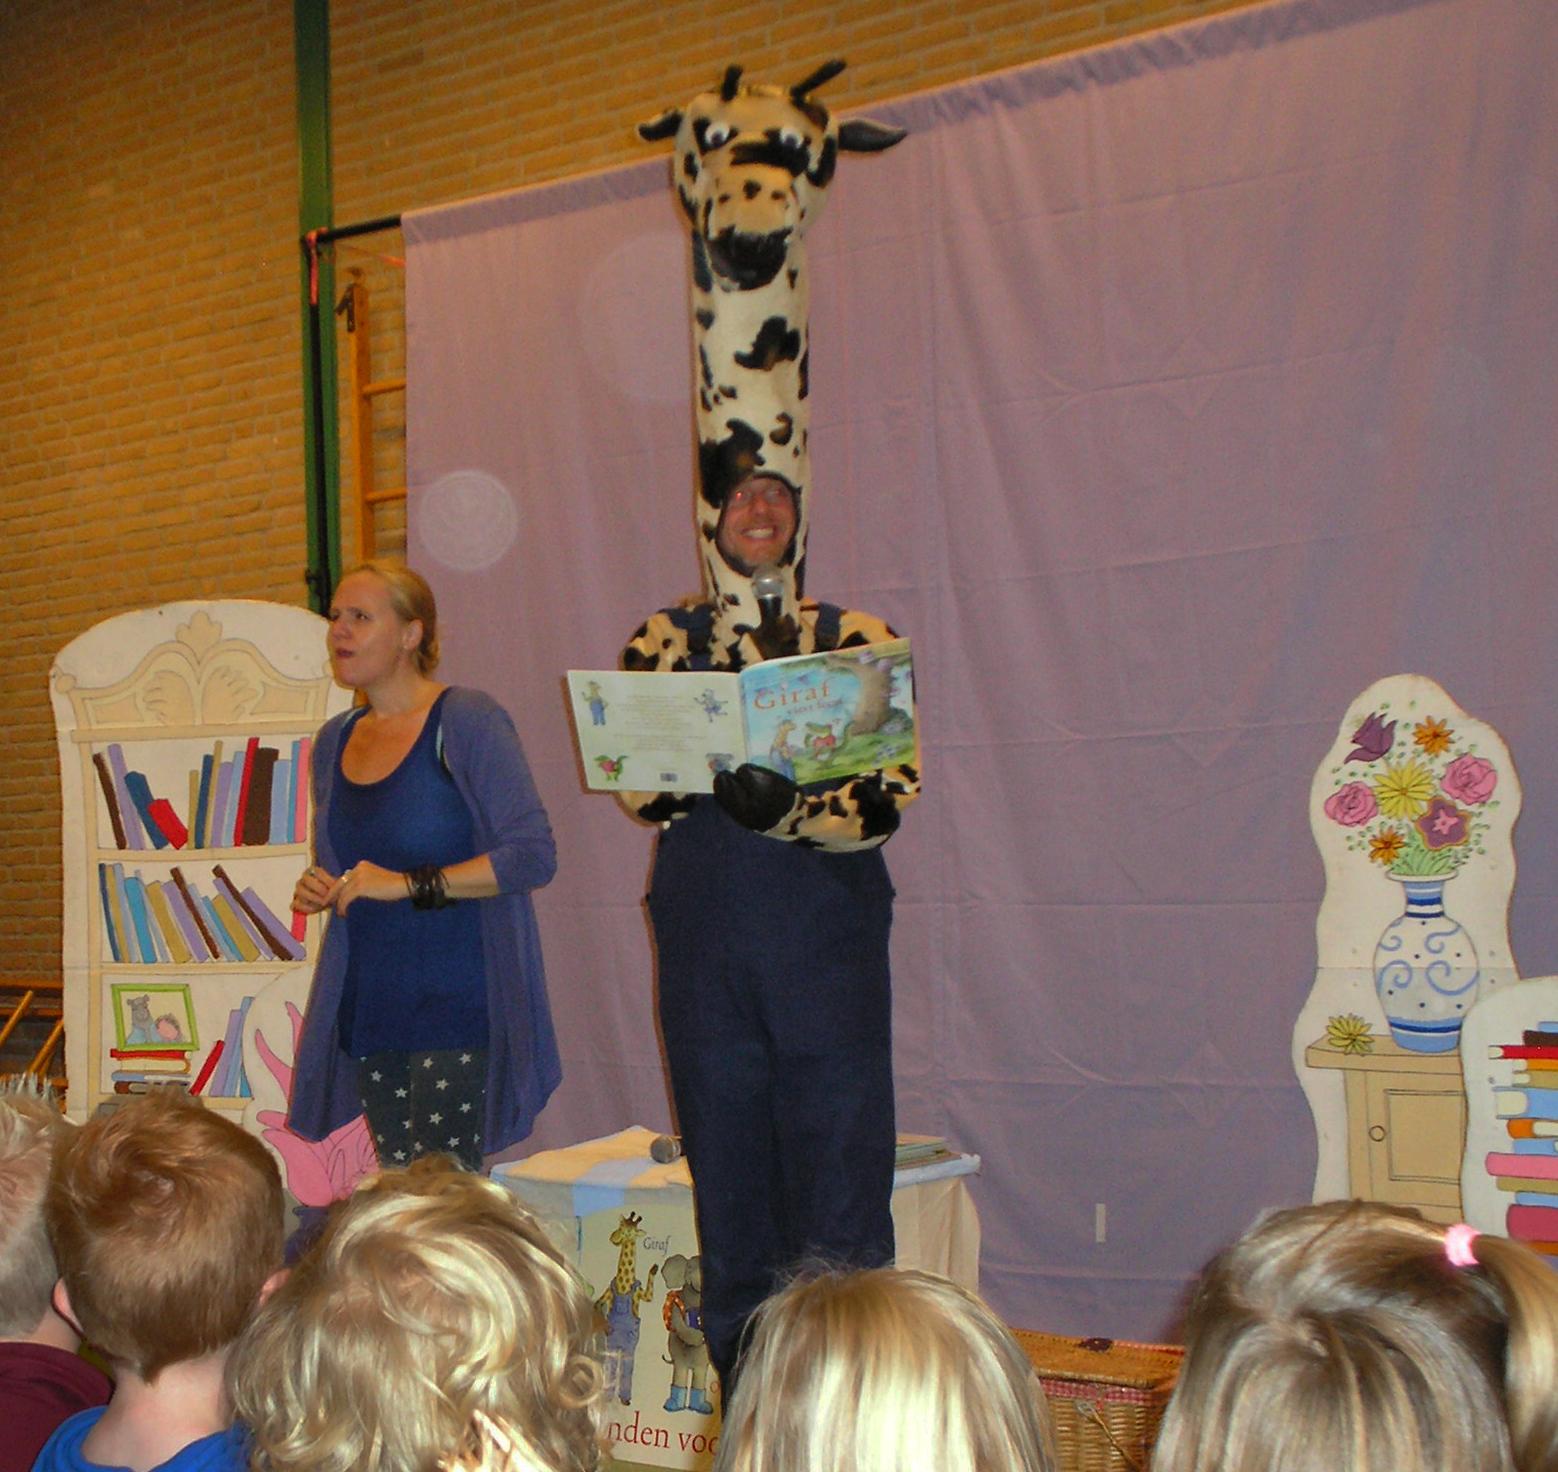 de vertelvoorstelling Giraf viert feest